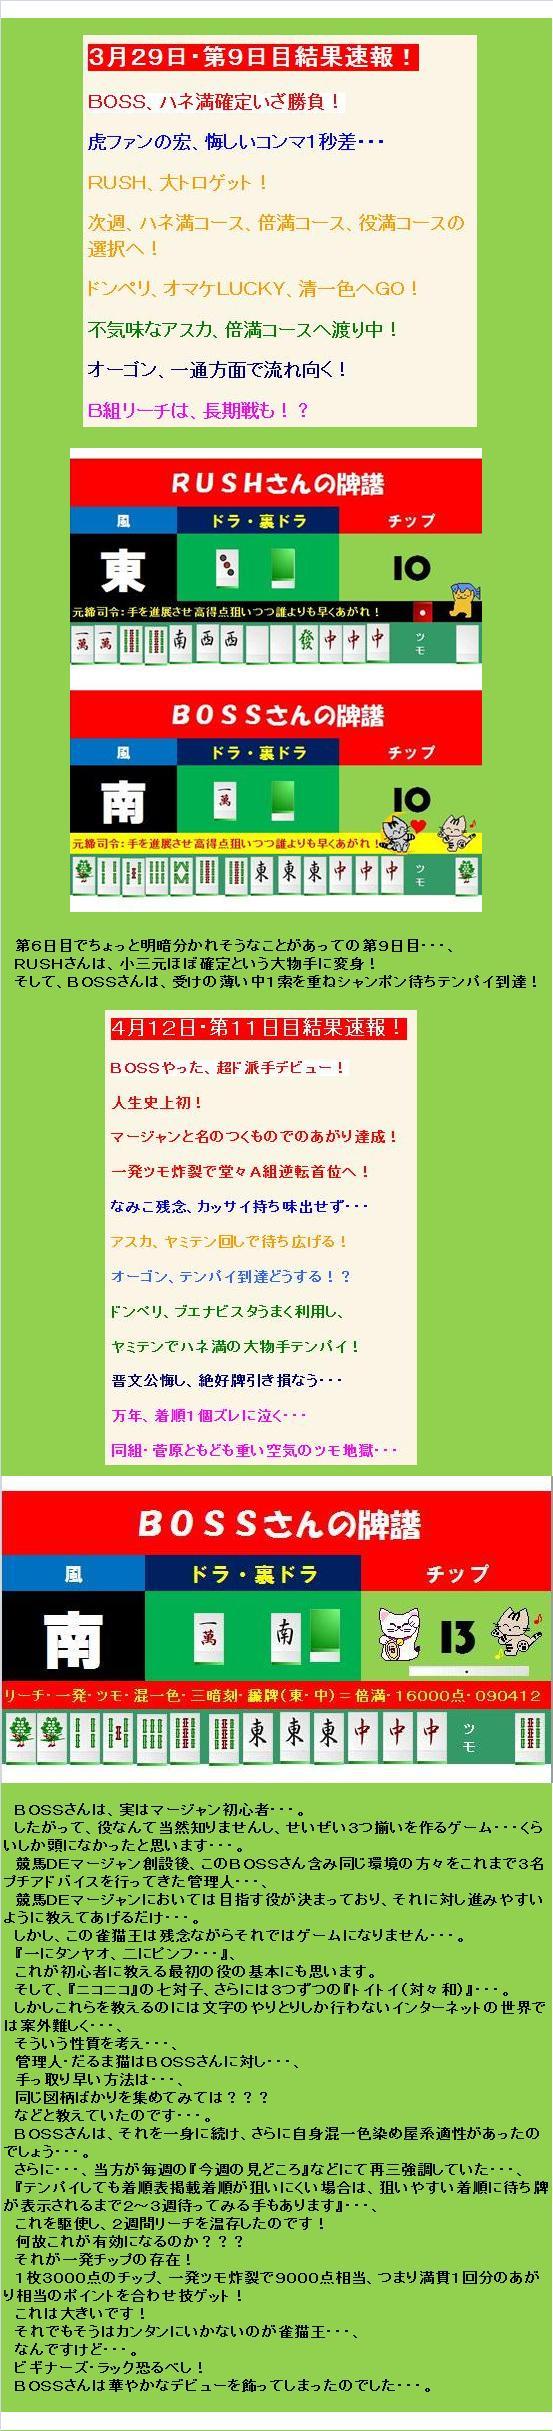 20100226・A組回顧06.jpg